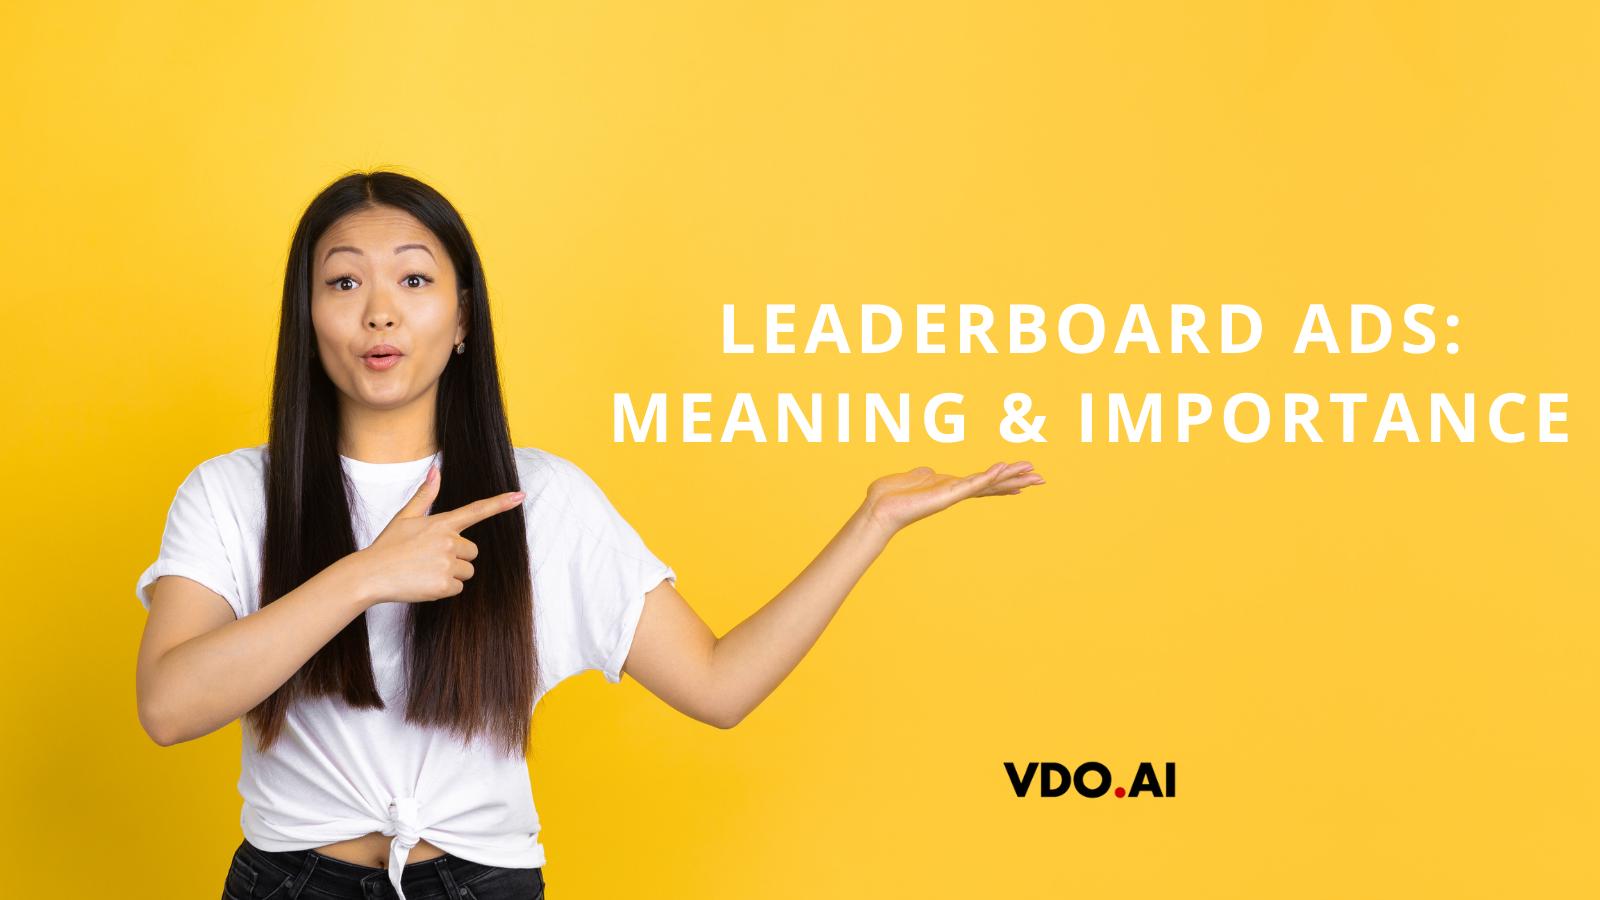 Leaderboard Ads